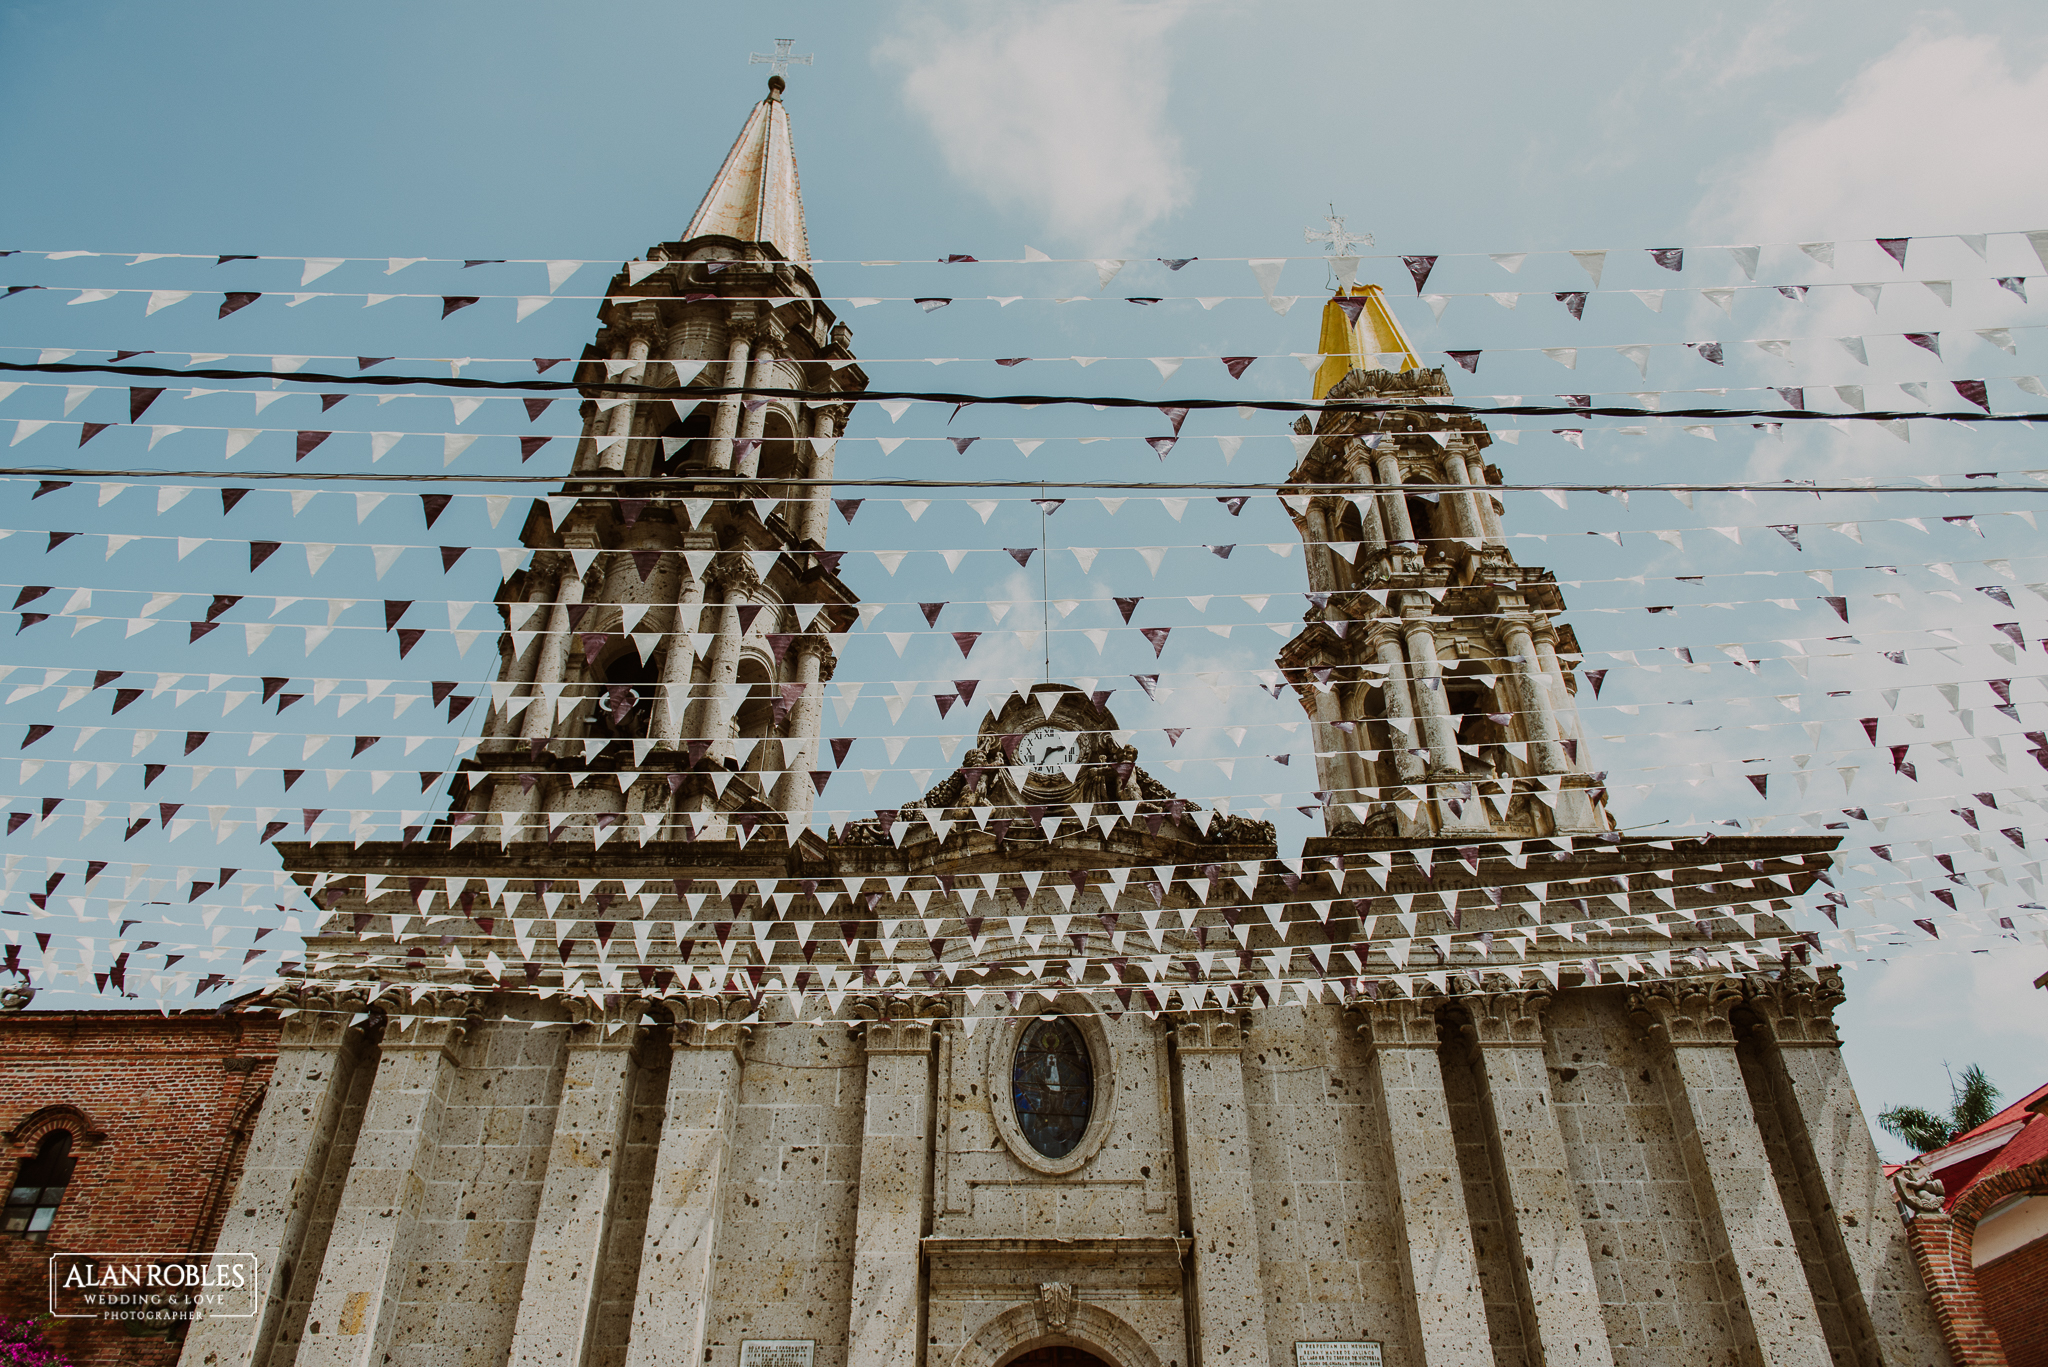 Iglesia de Chapala, Parroquia de San Francisco. Alan Robles Fotografo de Bodas. Destination Wedding. Fotografia de bodas.